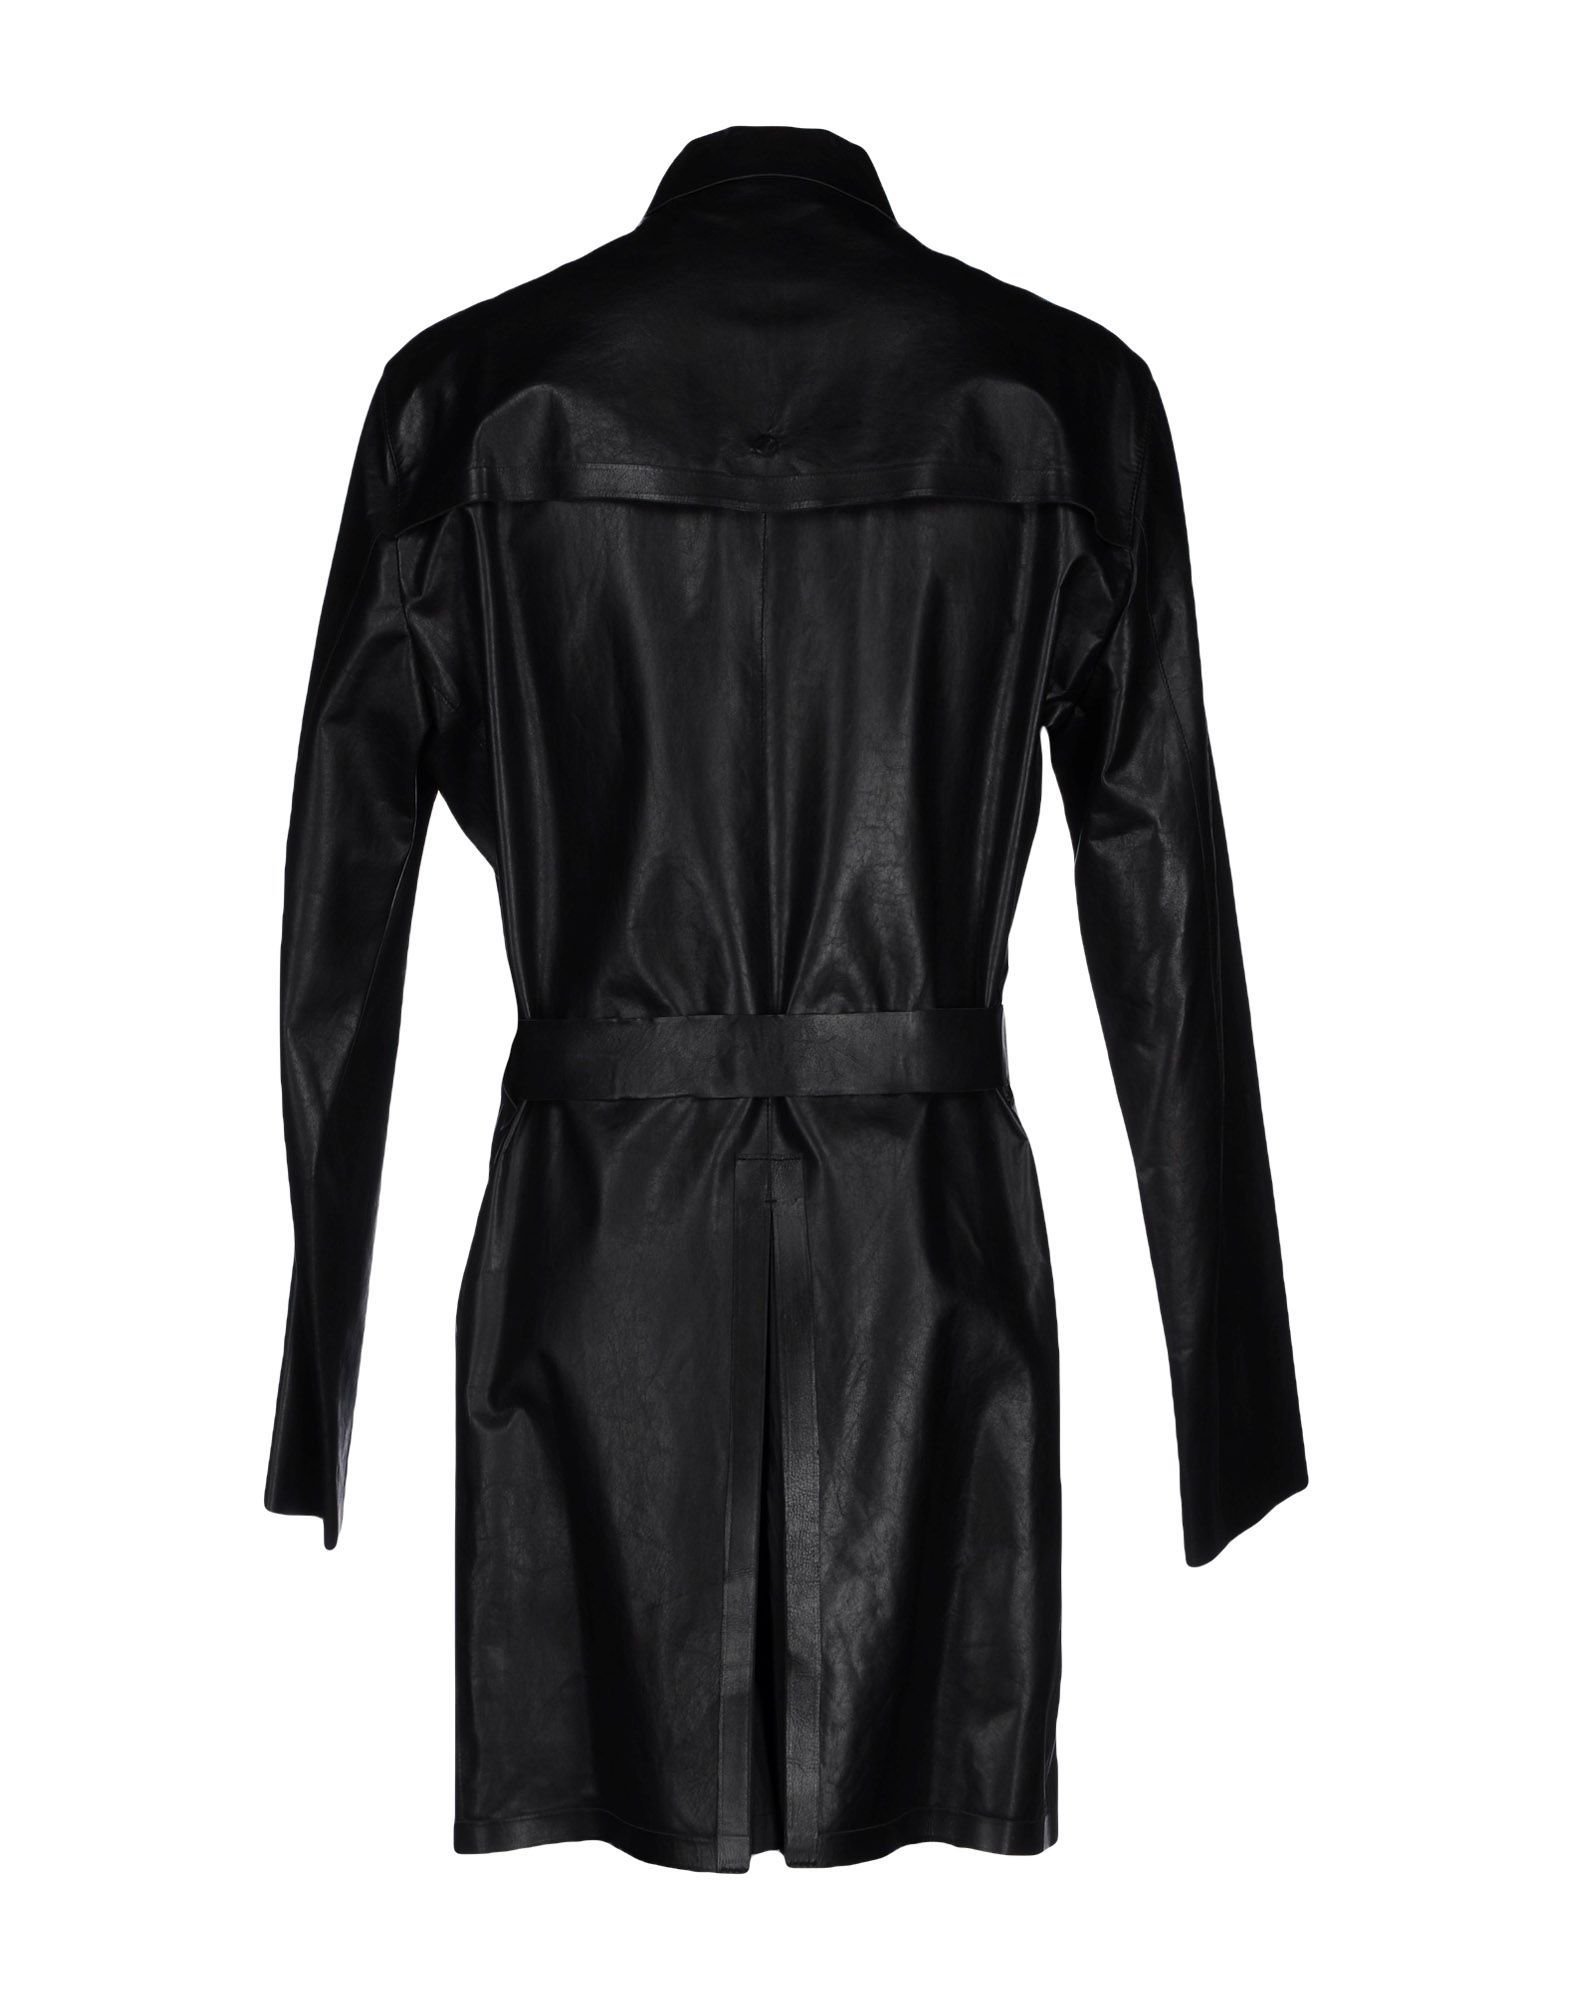 Emporio Armani Black Calf Leather Belted Coat